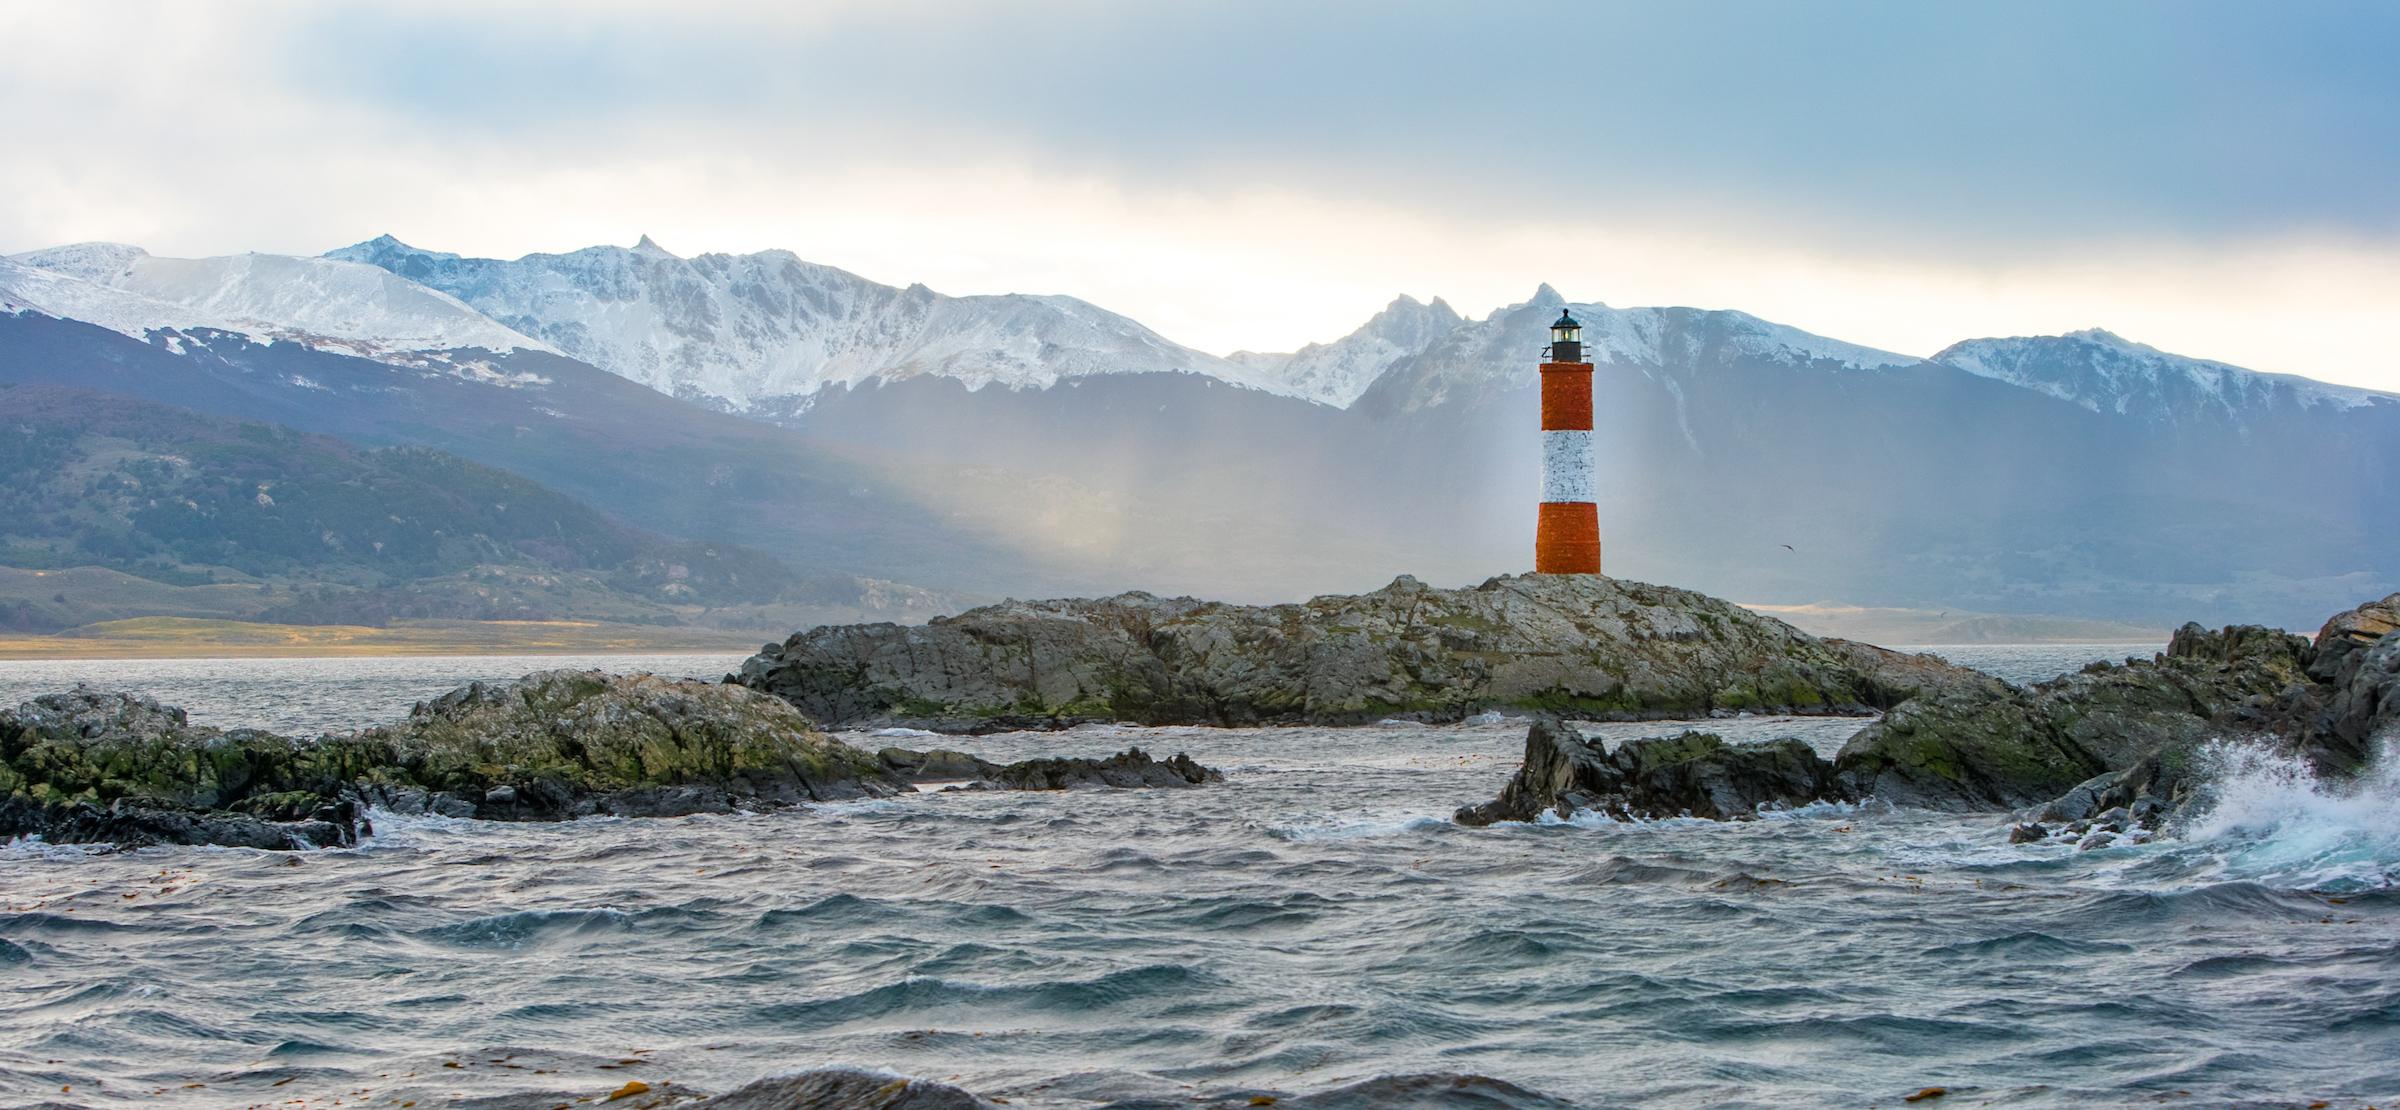 Patagonia South America >> Tierra del Fuego United by AdventureWeek | Adventure Travel News